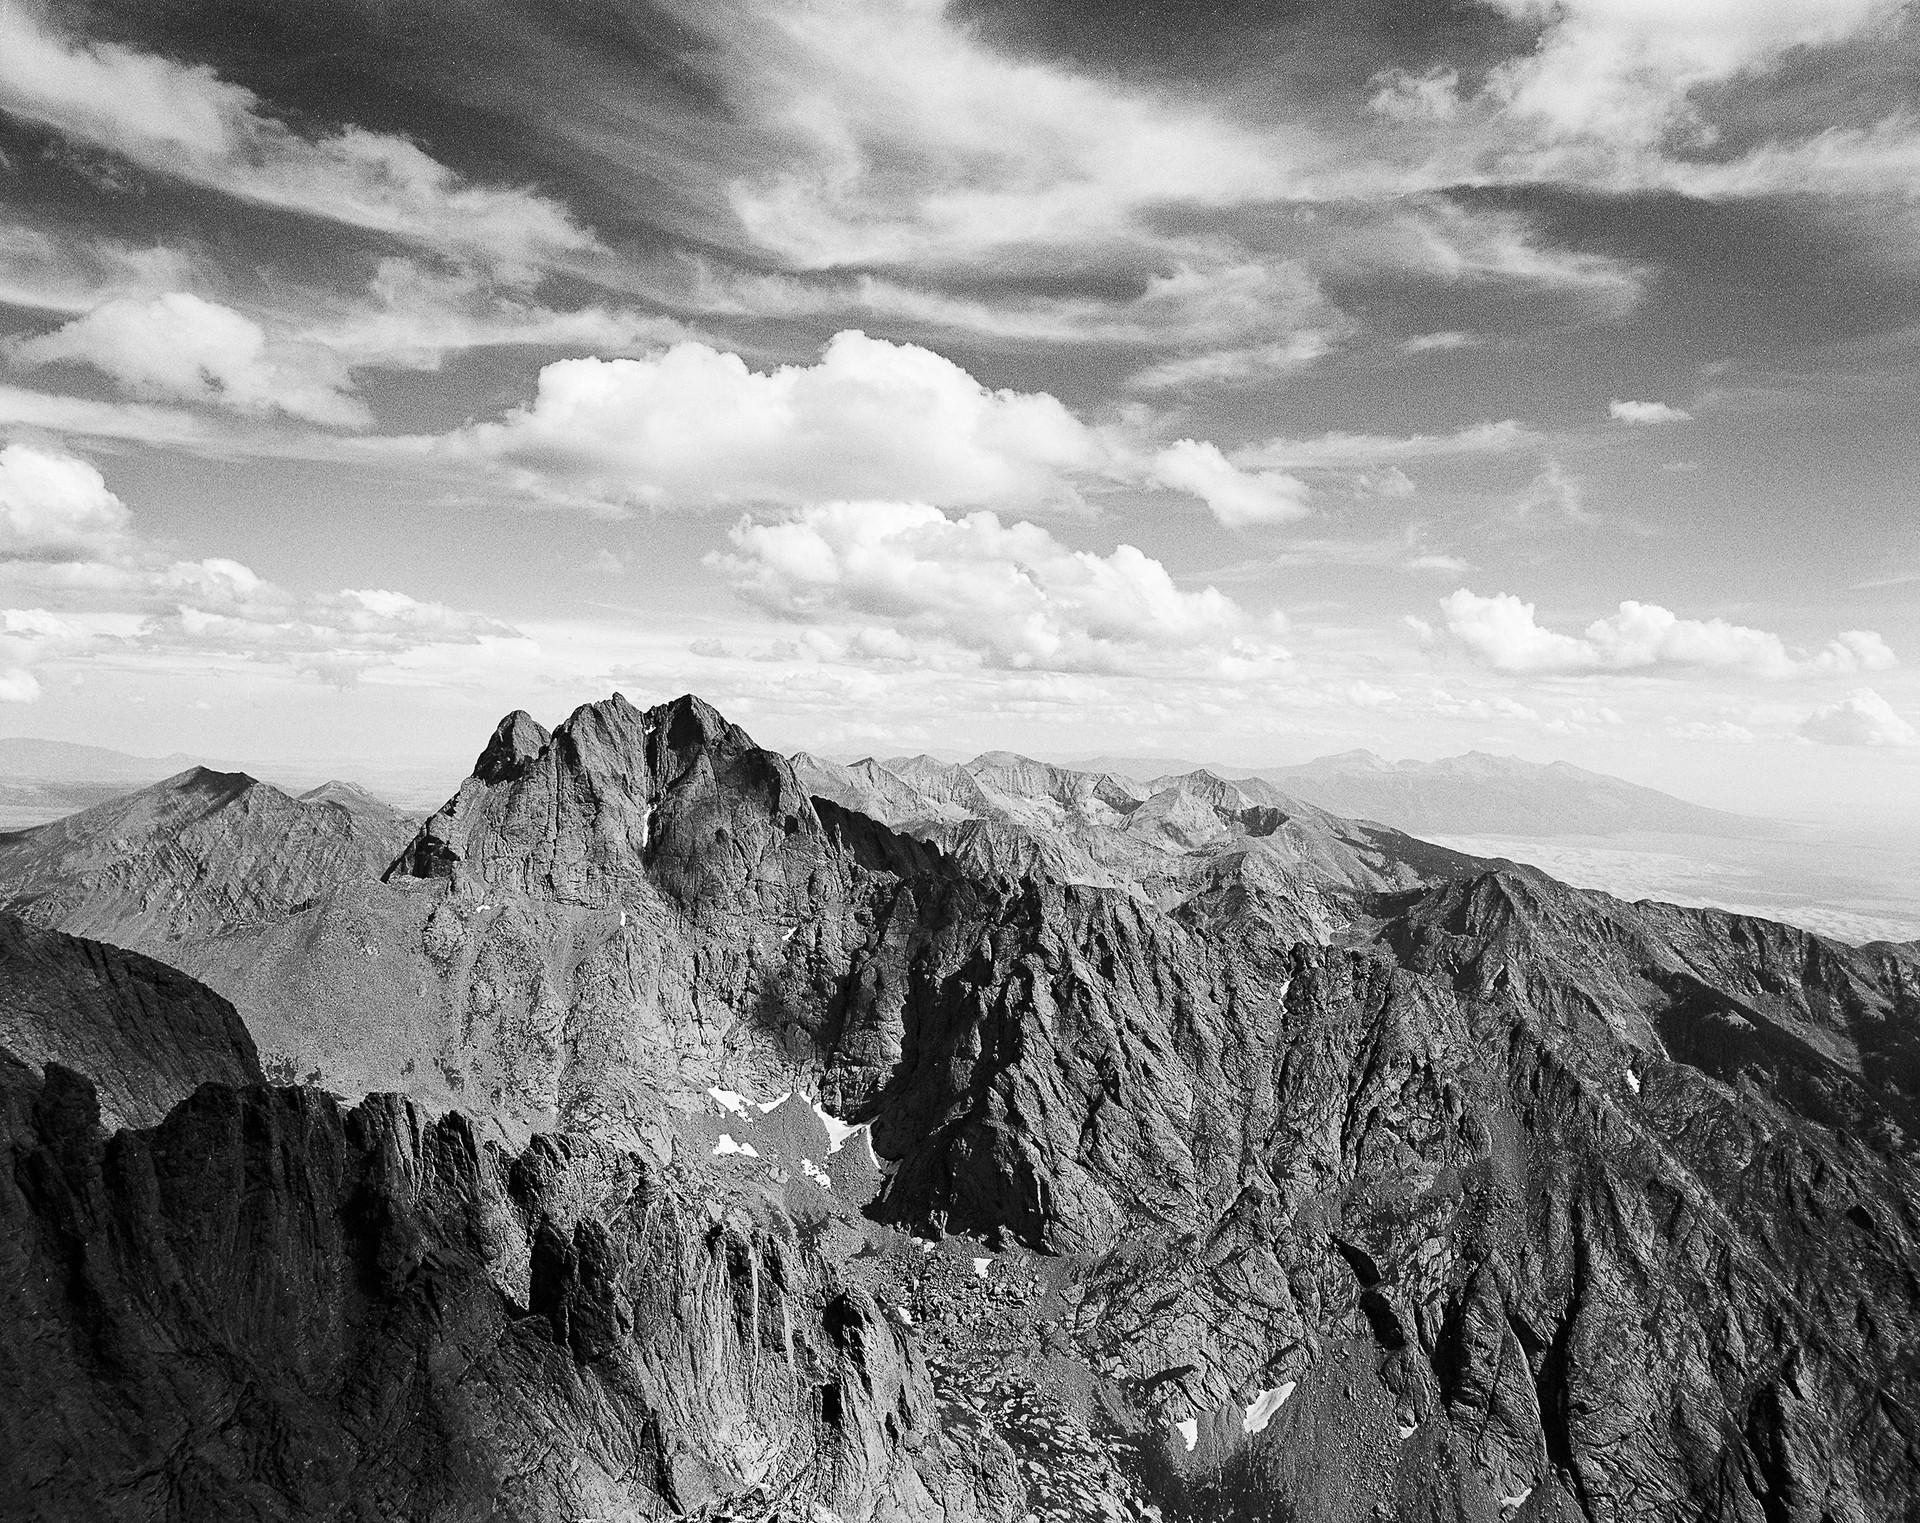 Crestone Peak from Kit Carson